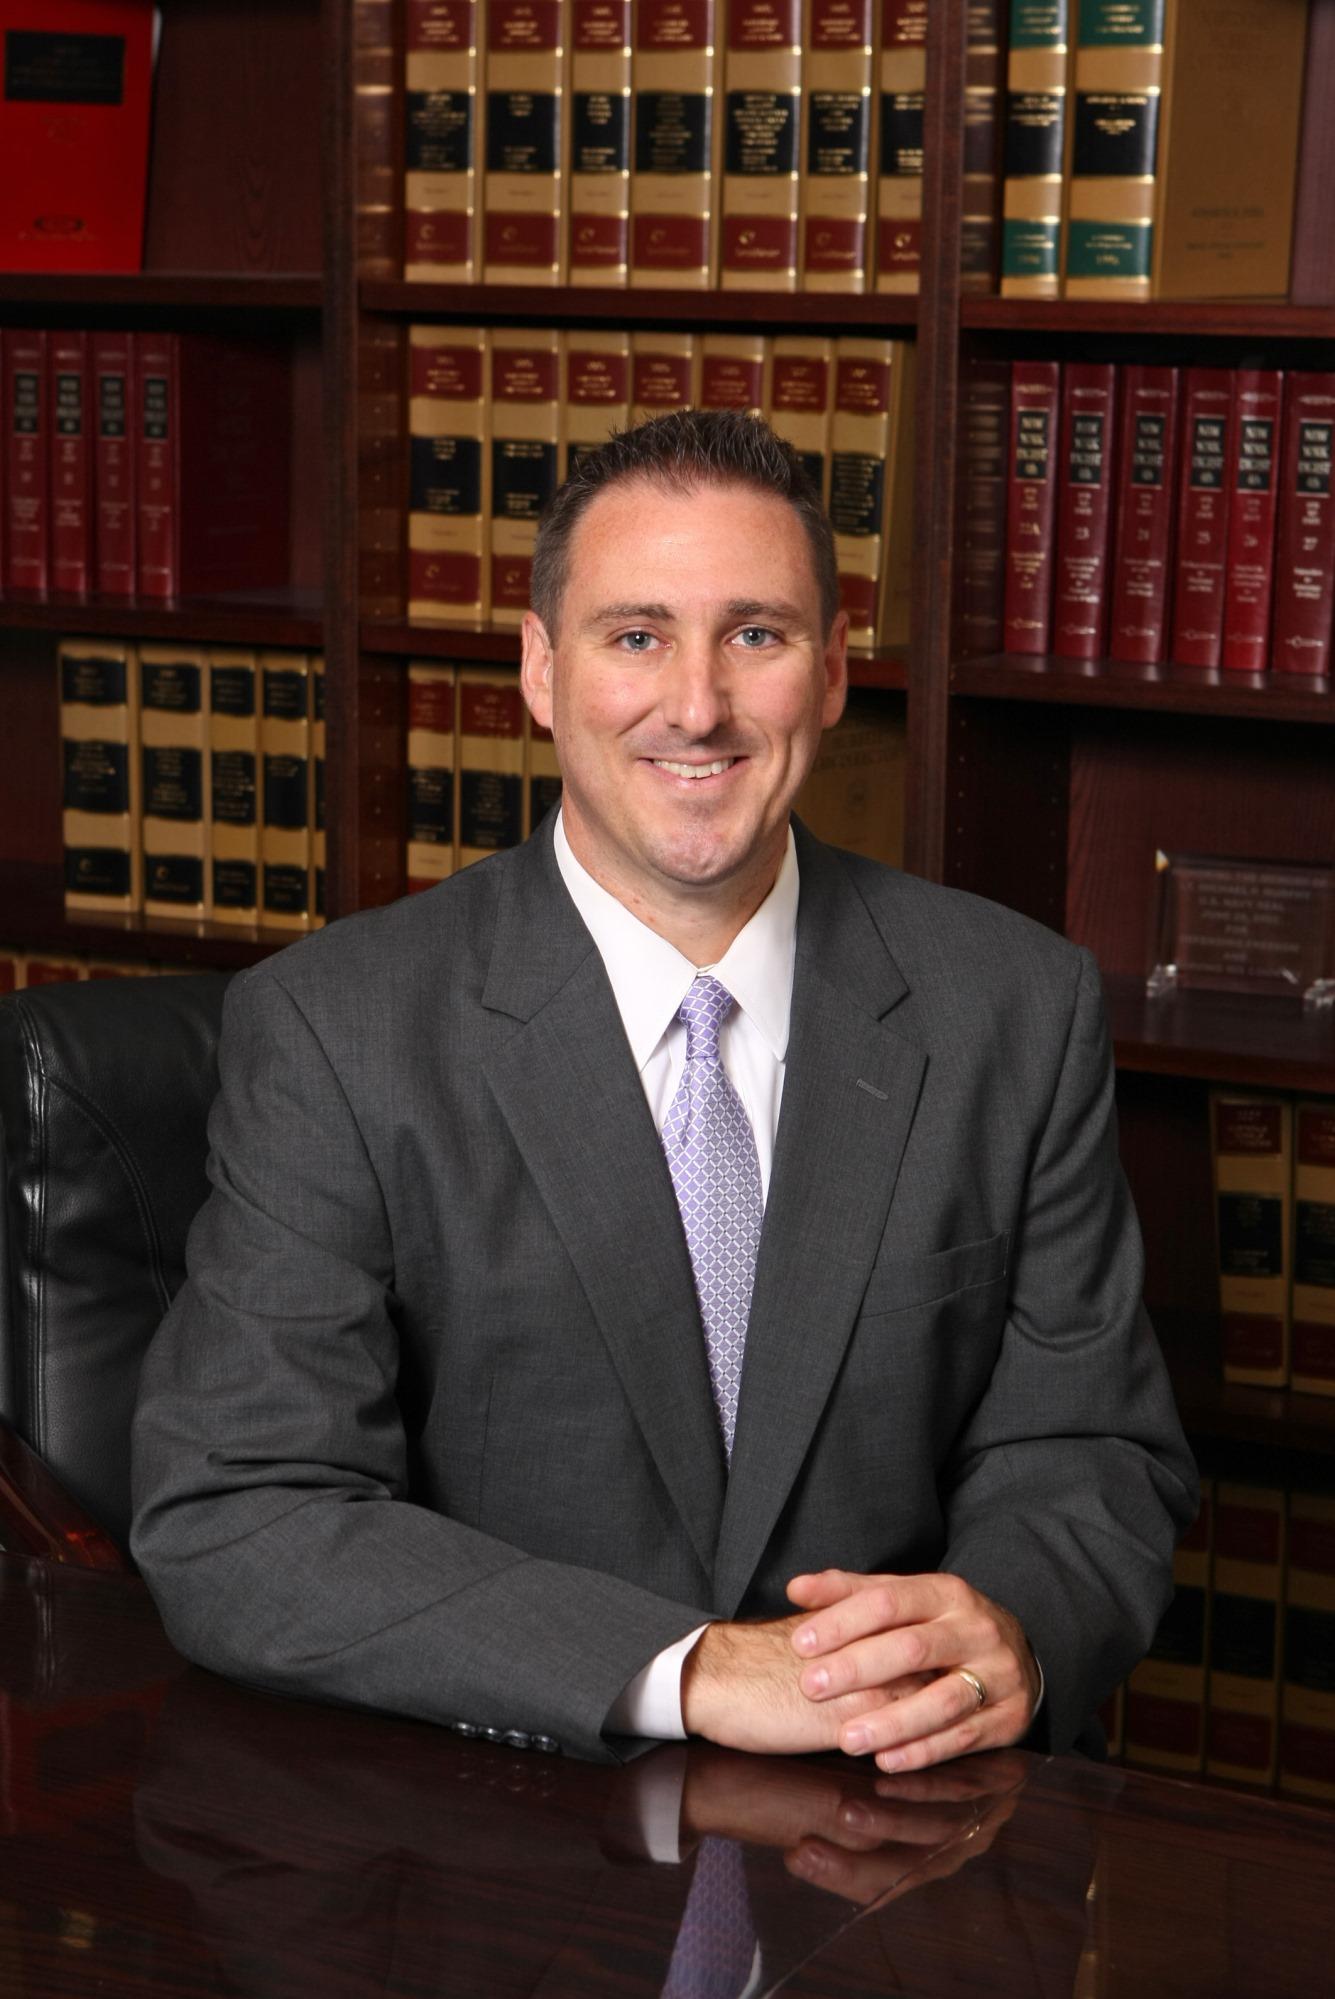 Bryan F. Lewis